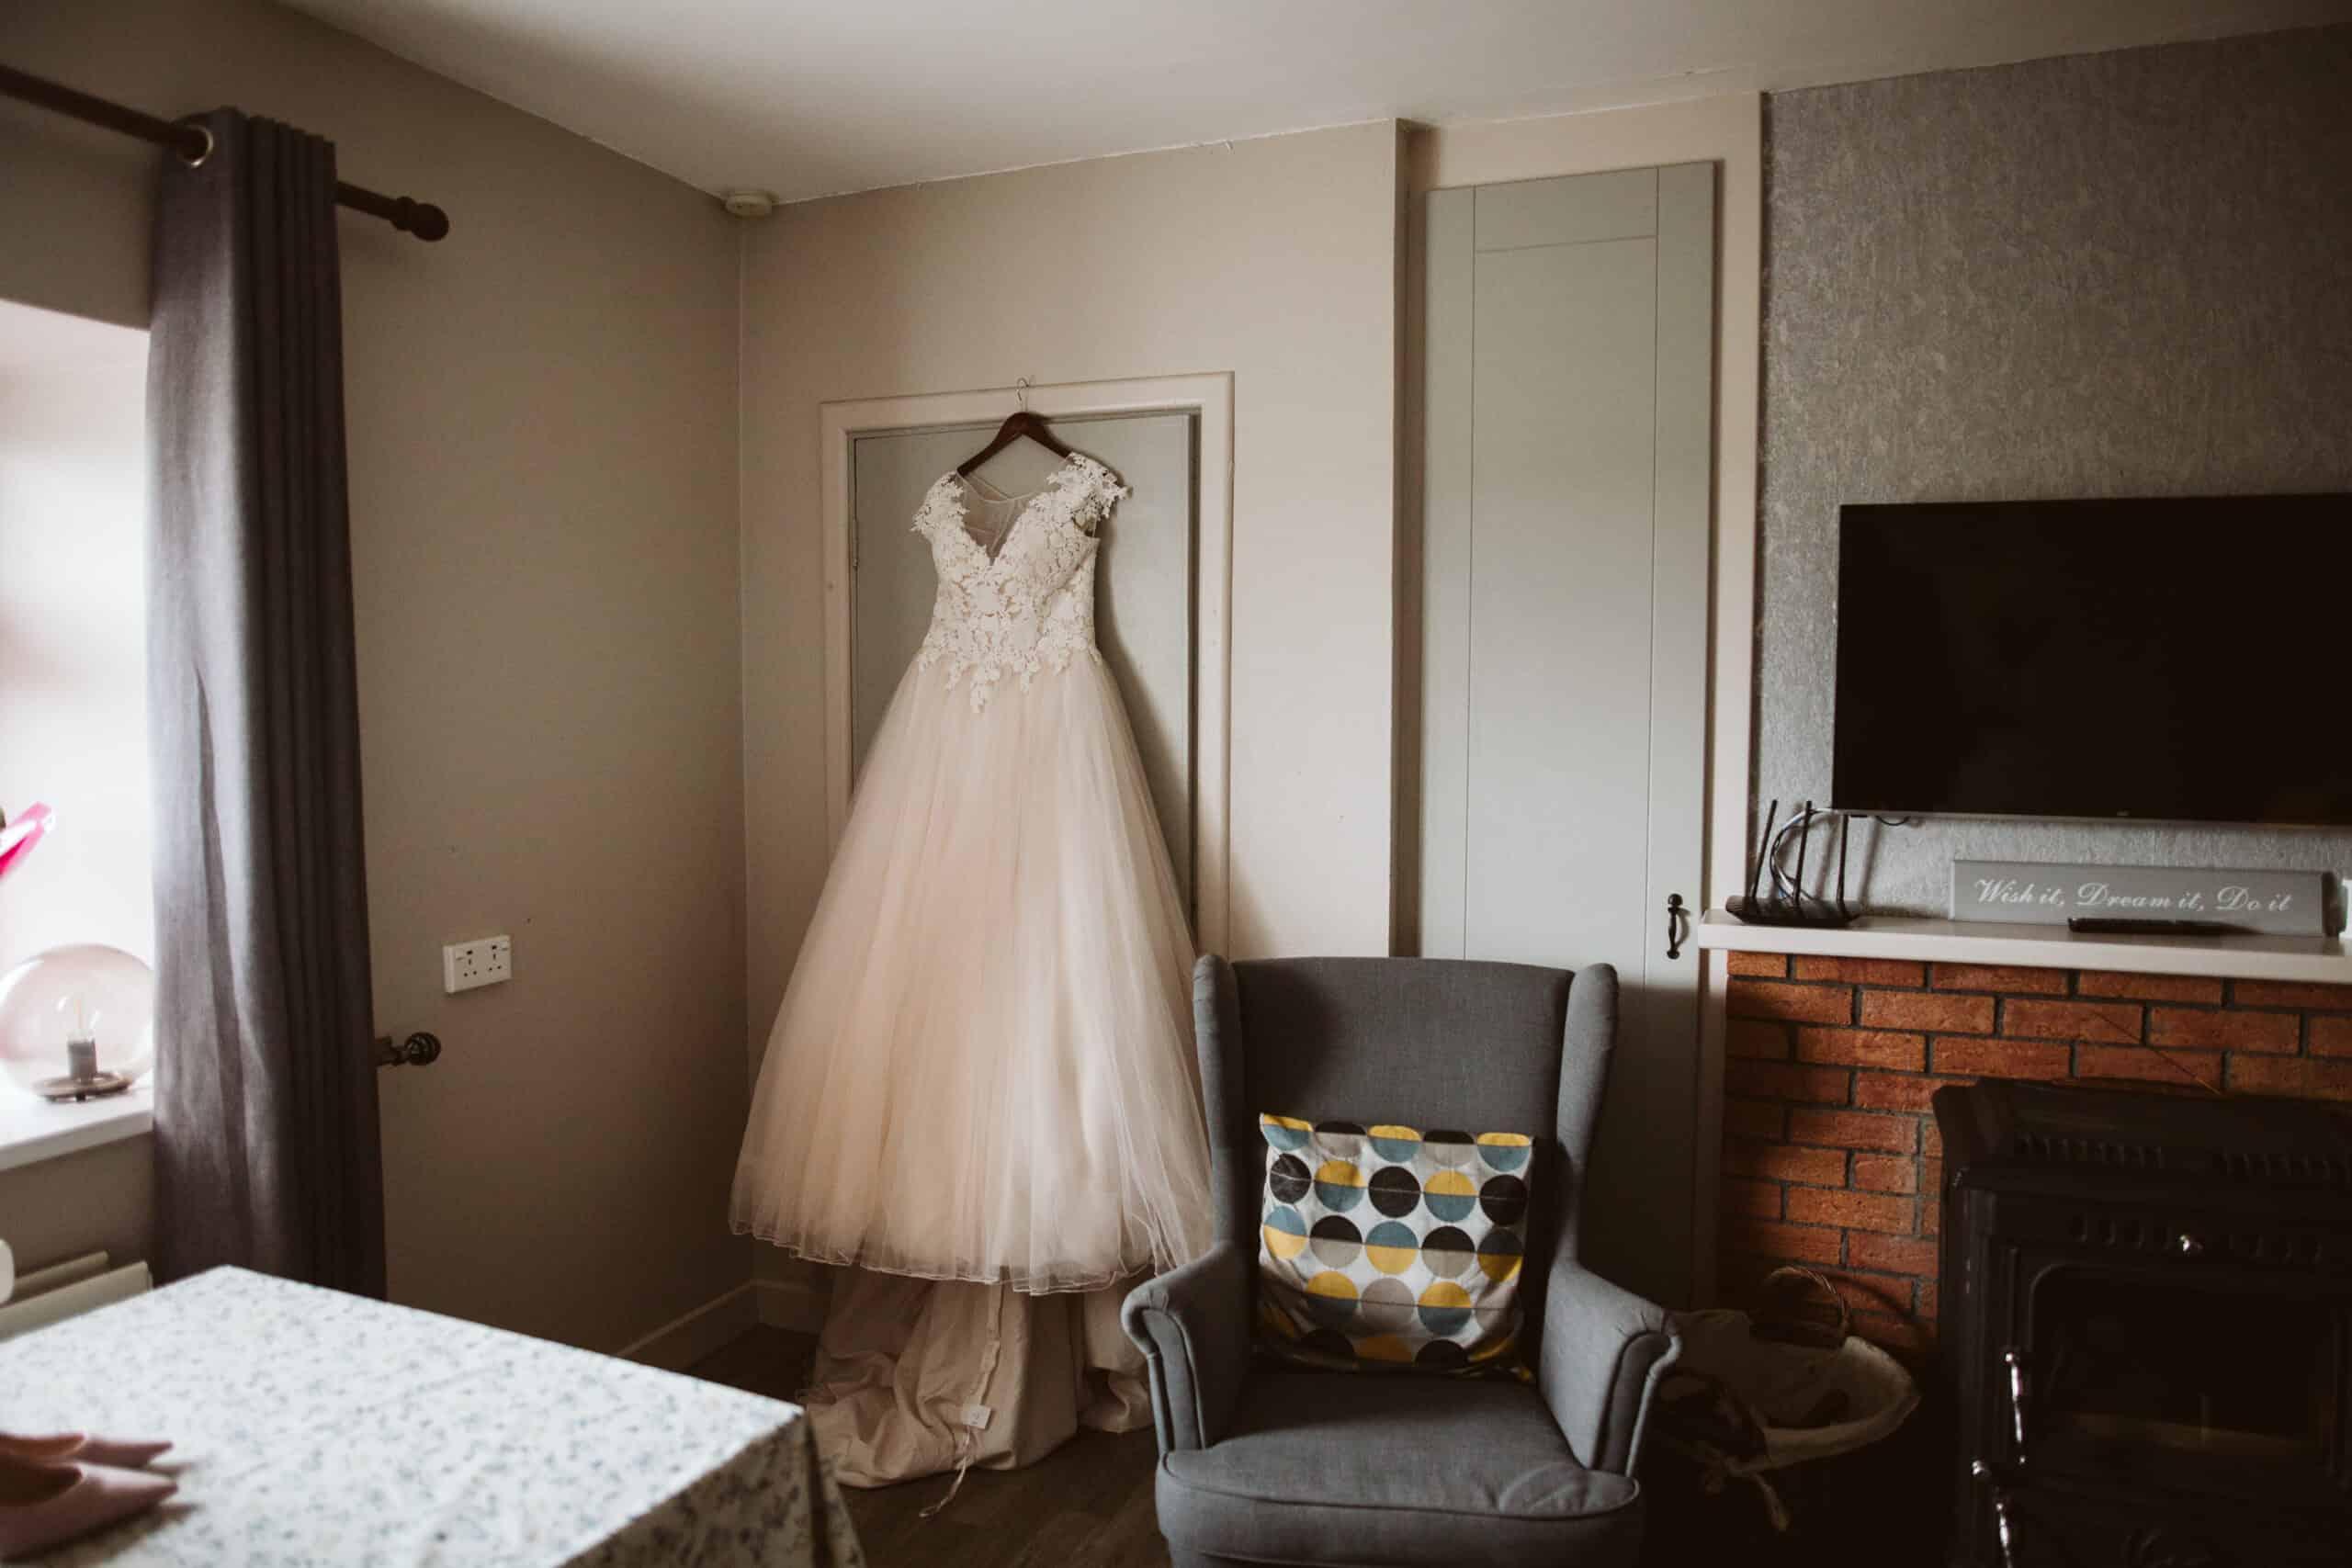 Cliffs of Moher Wedding Hags head, lace wedding dress